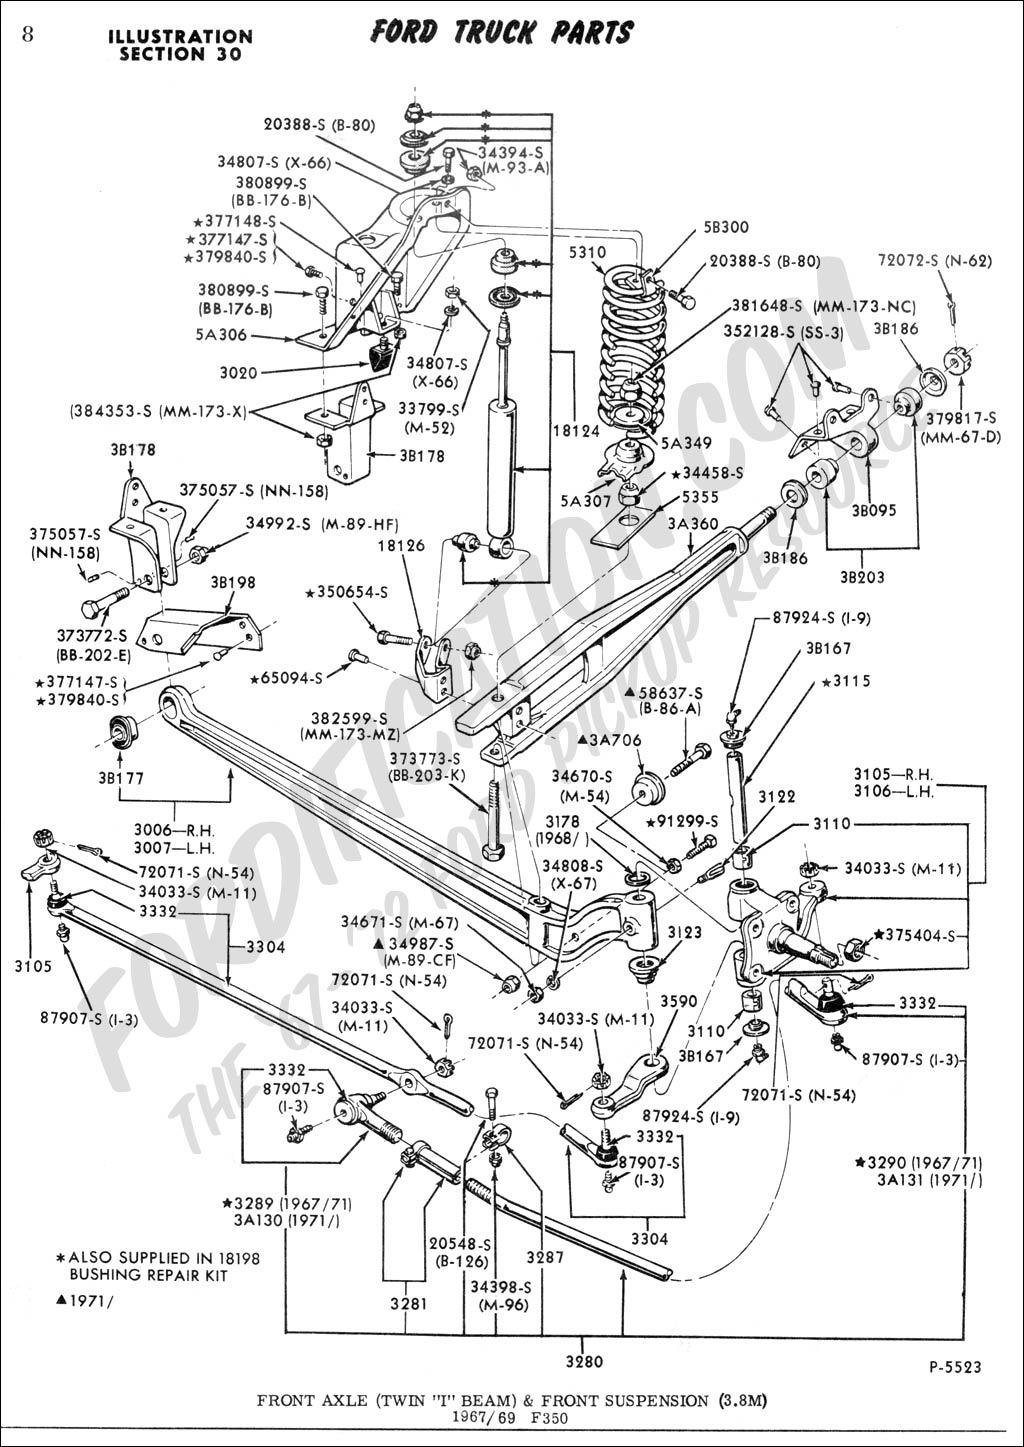 2002 f250 4x4 wiring diagram